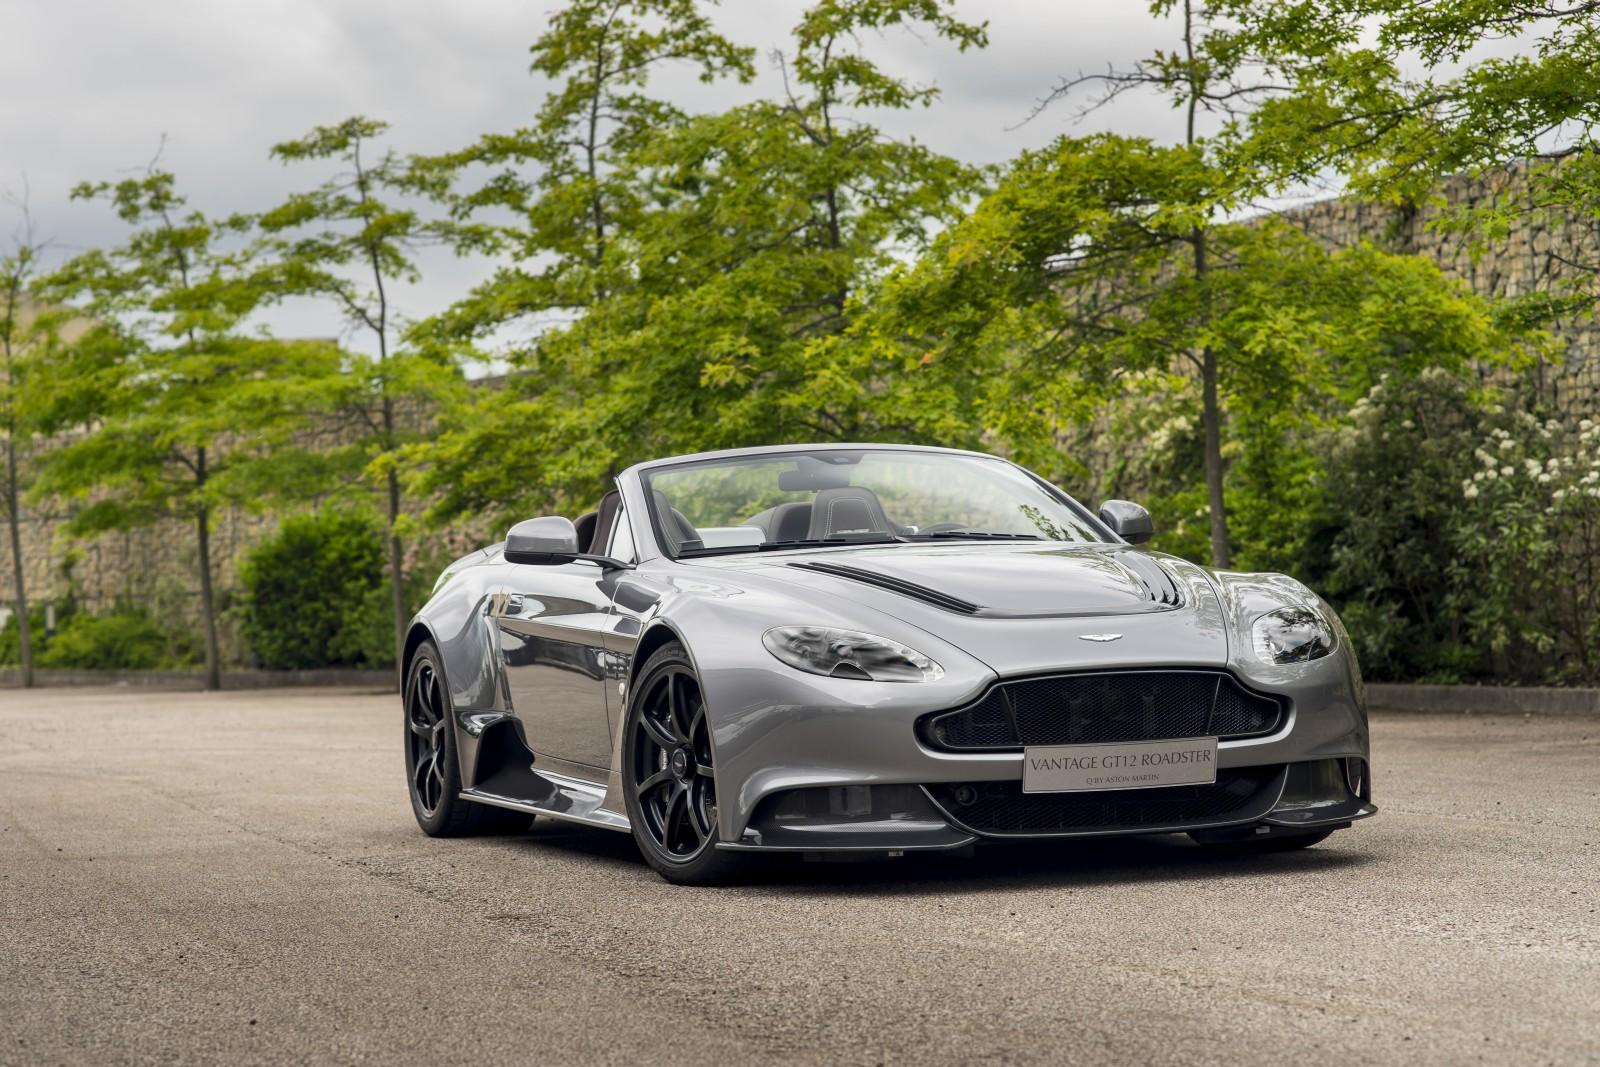 Aston Martin - Vantage GT12 Roadster (1)